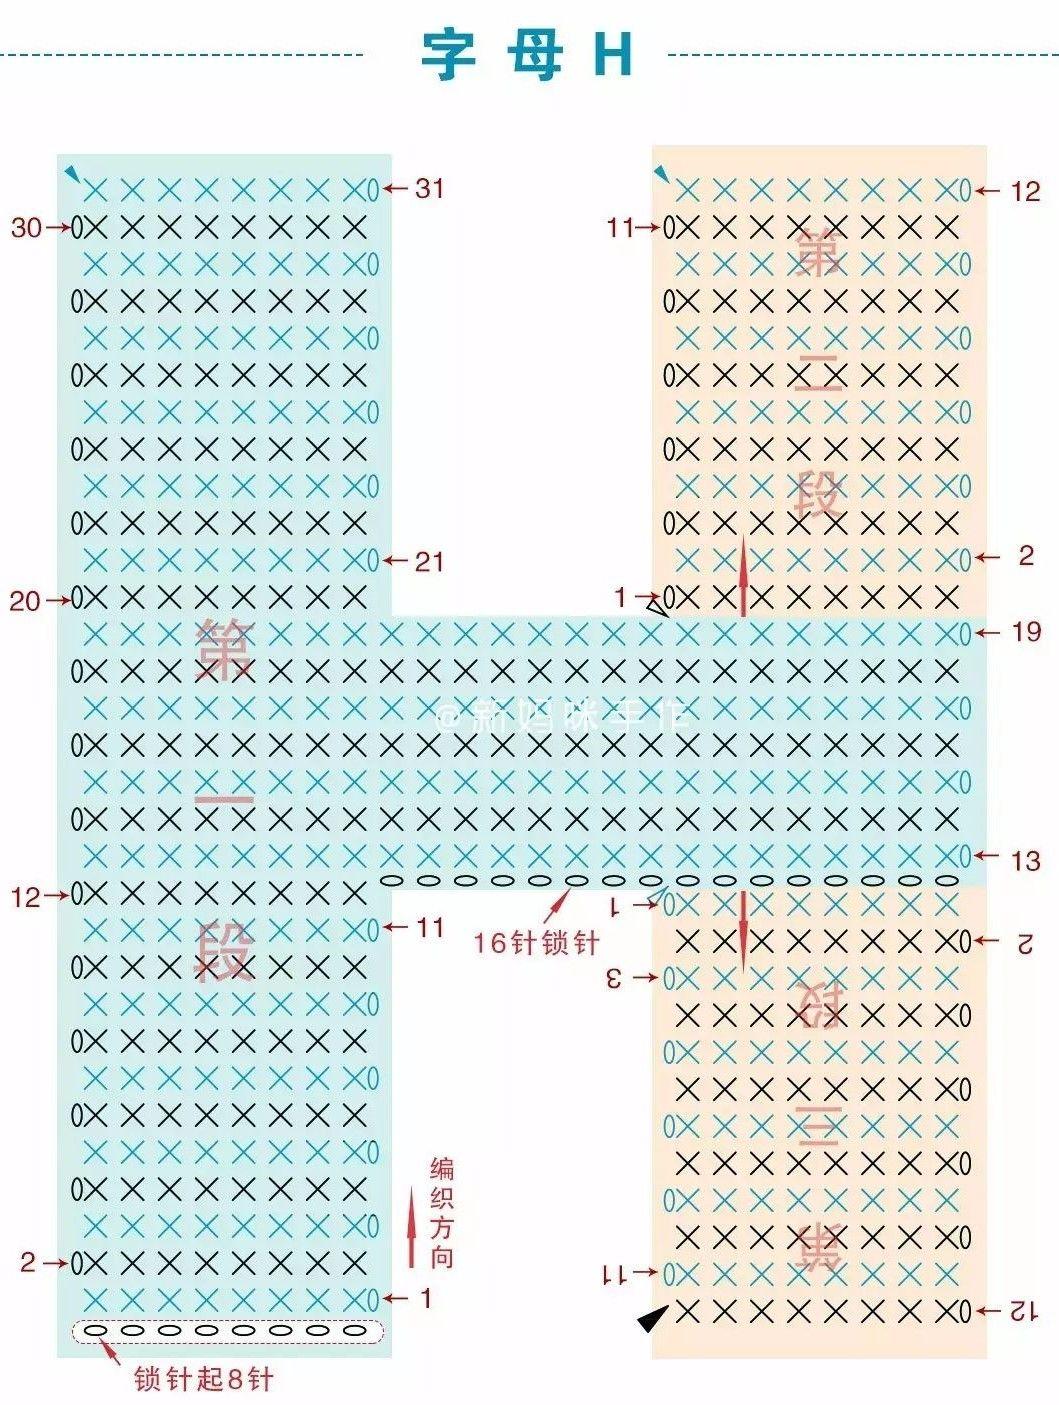 Pin de La Reina del Crochet en Tipografías crochet | Pinterest ...